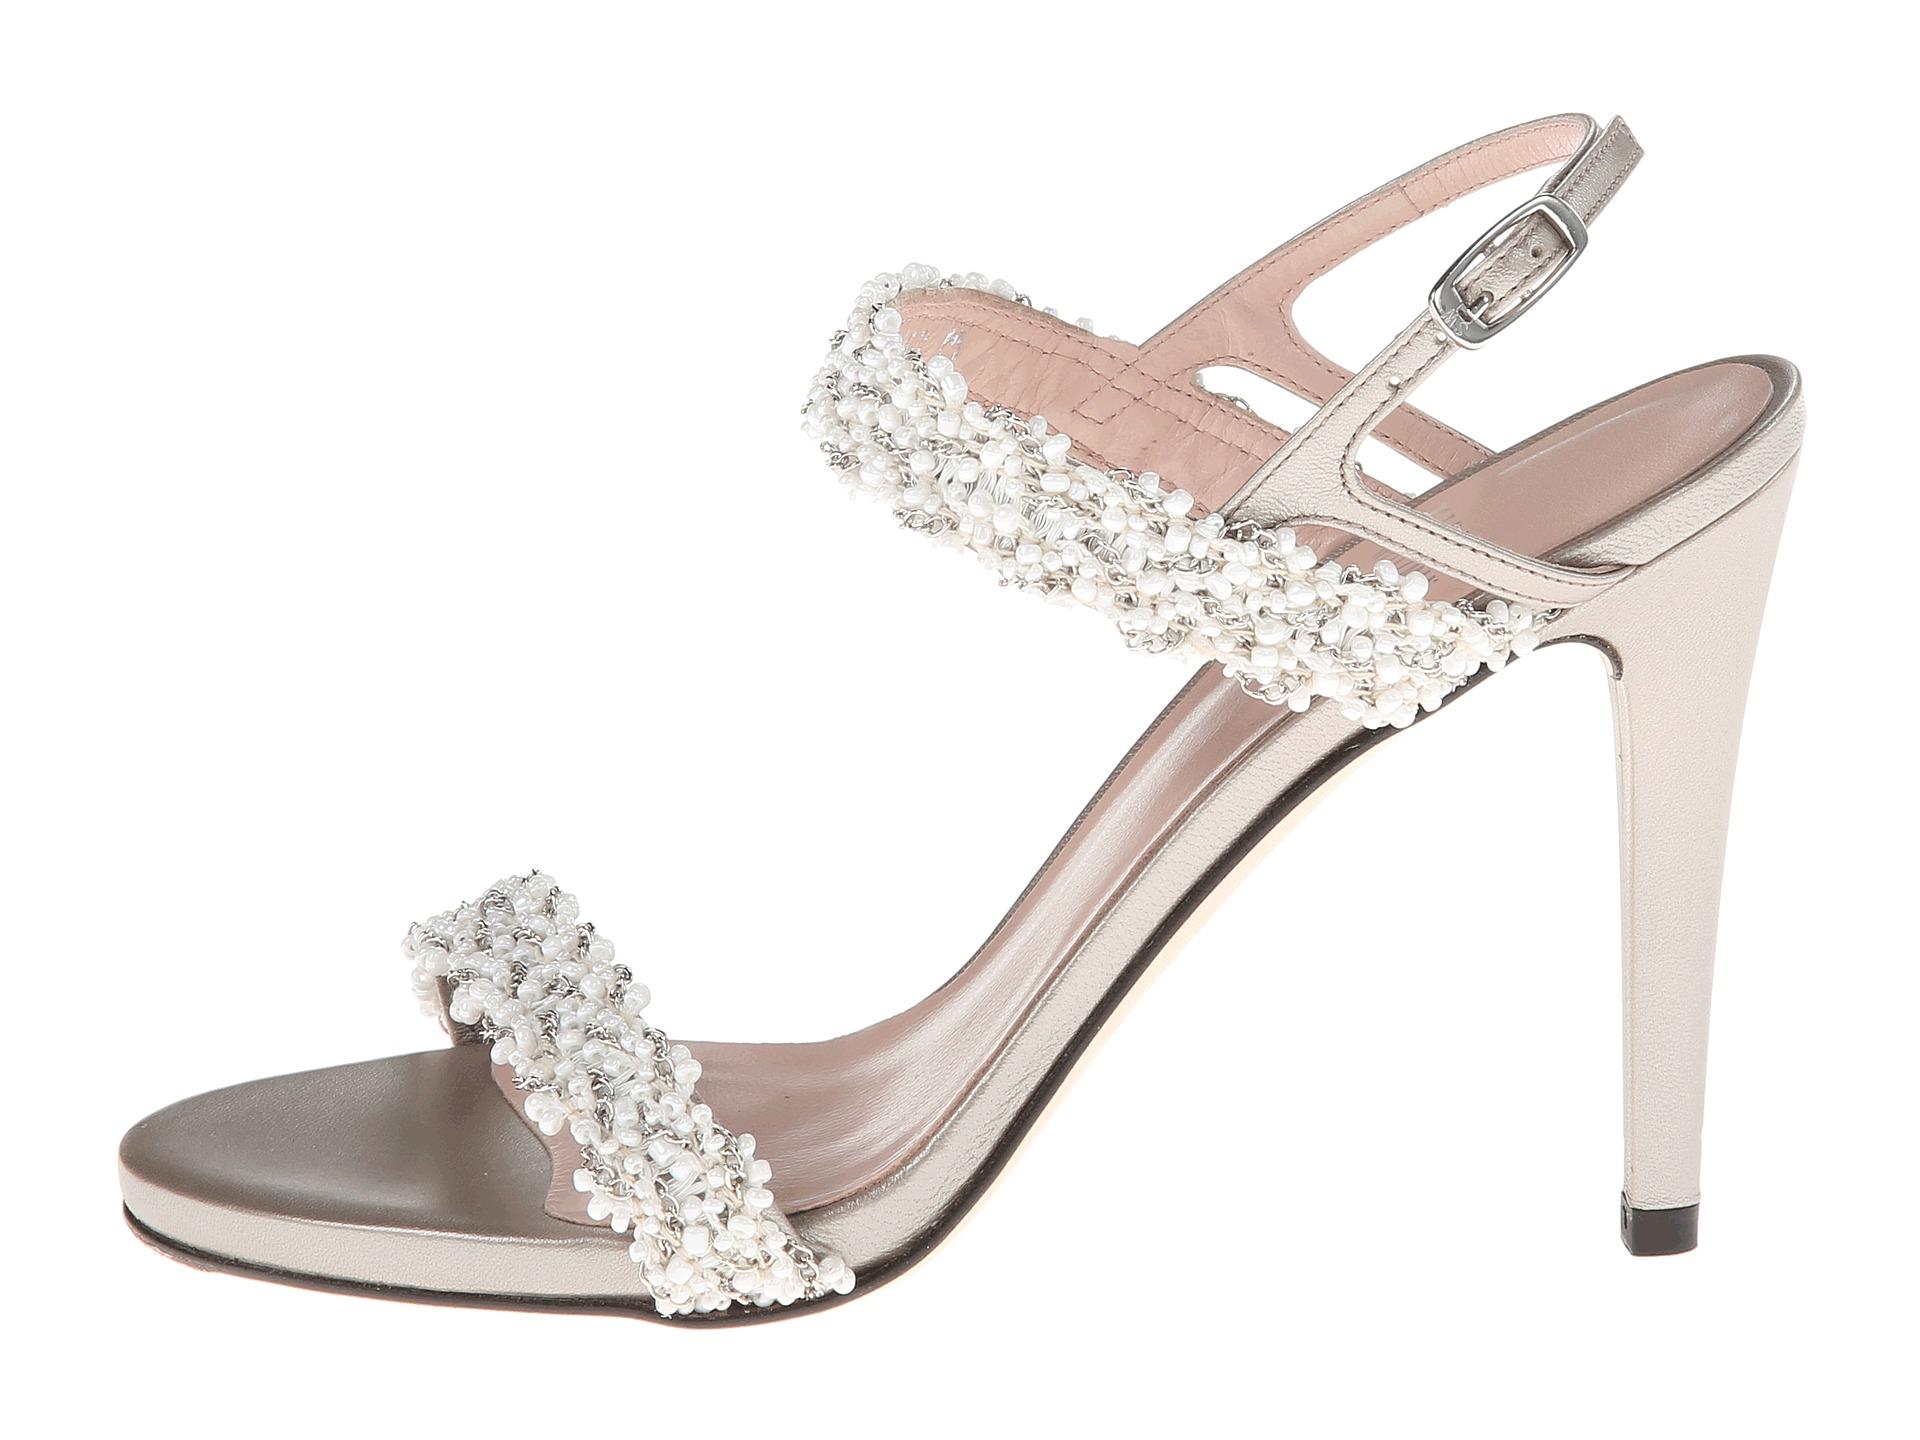 Stuart Weisman Wedding Shoes 023 - Stuart Weisman Wedding Shoes